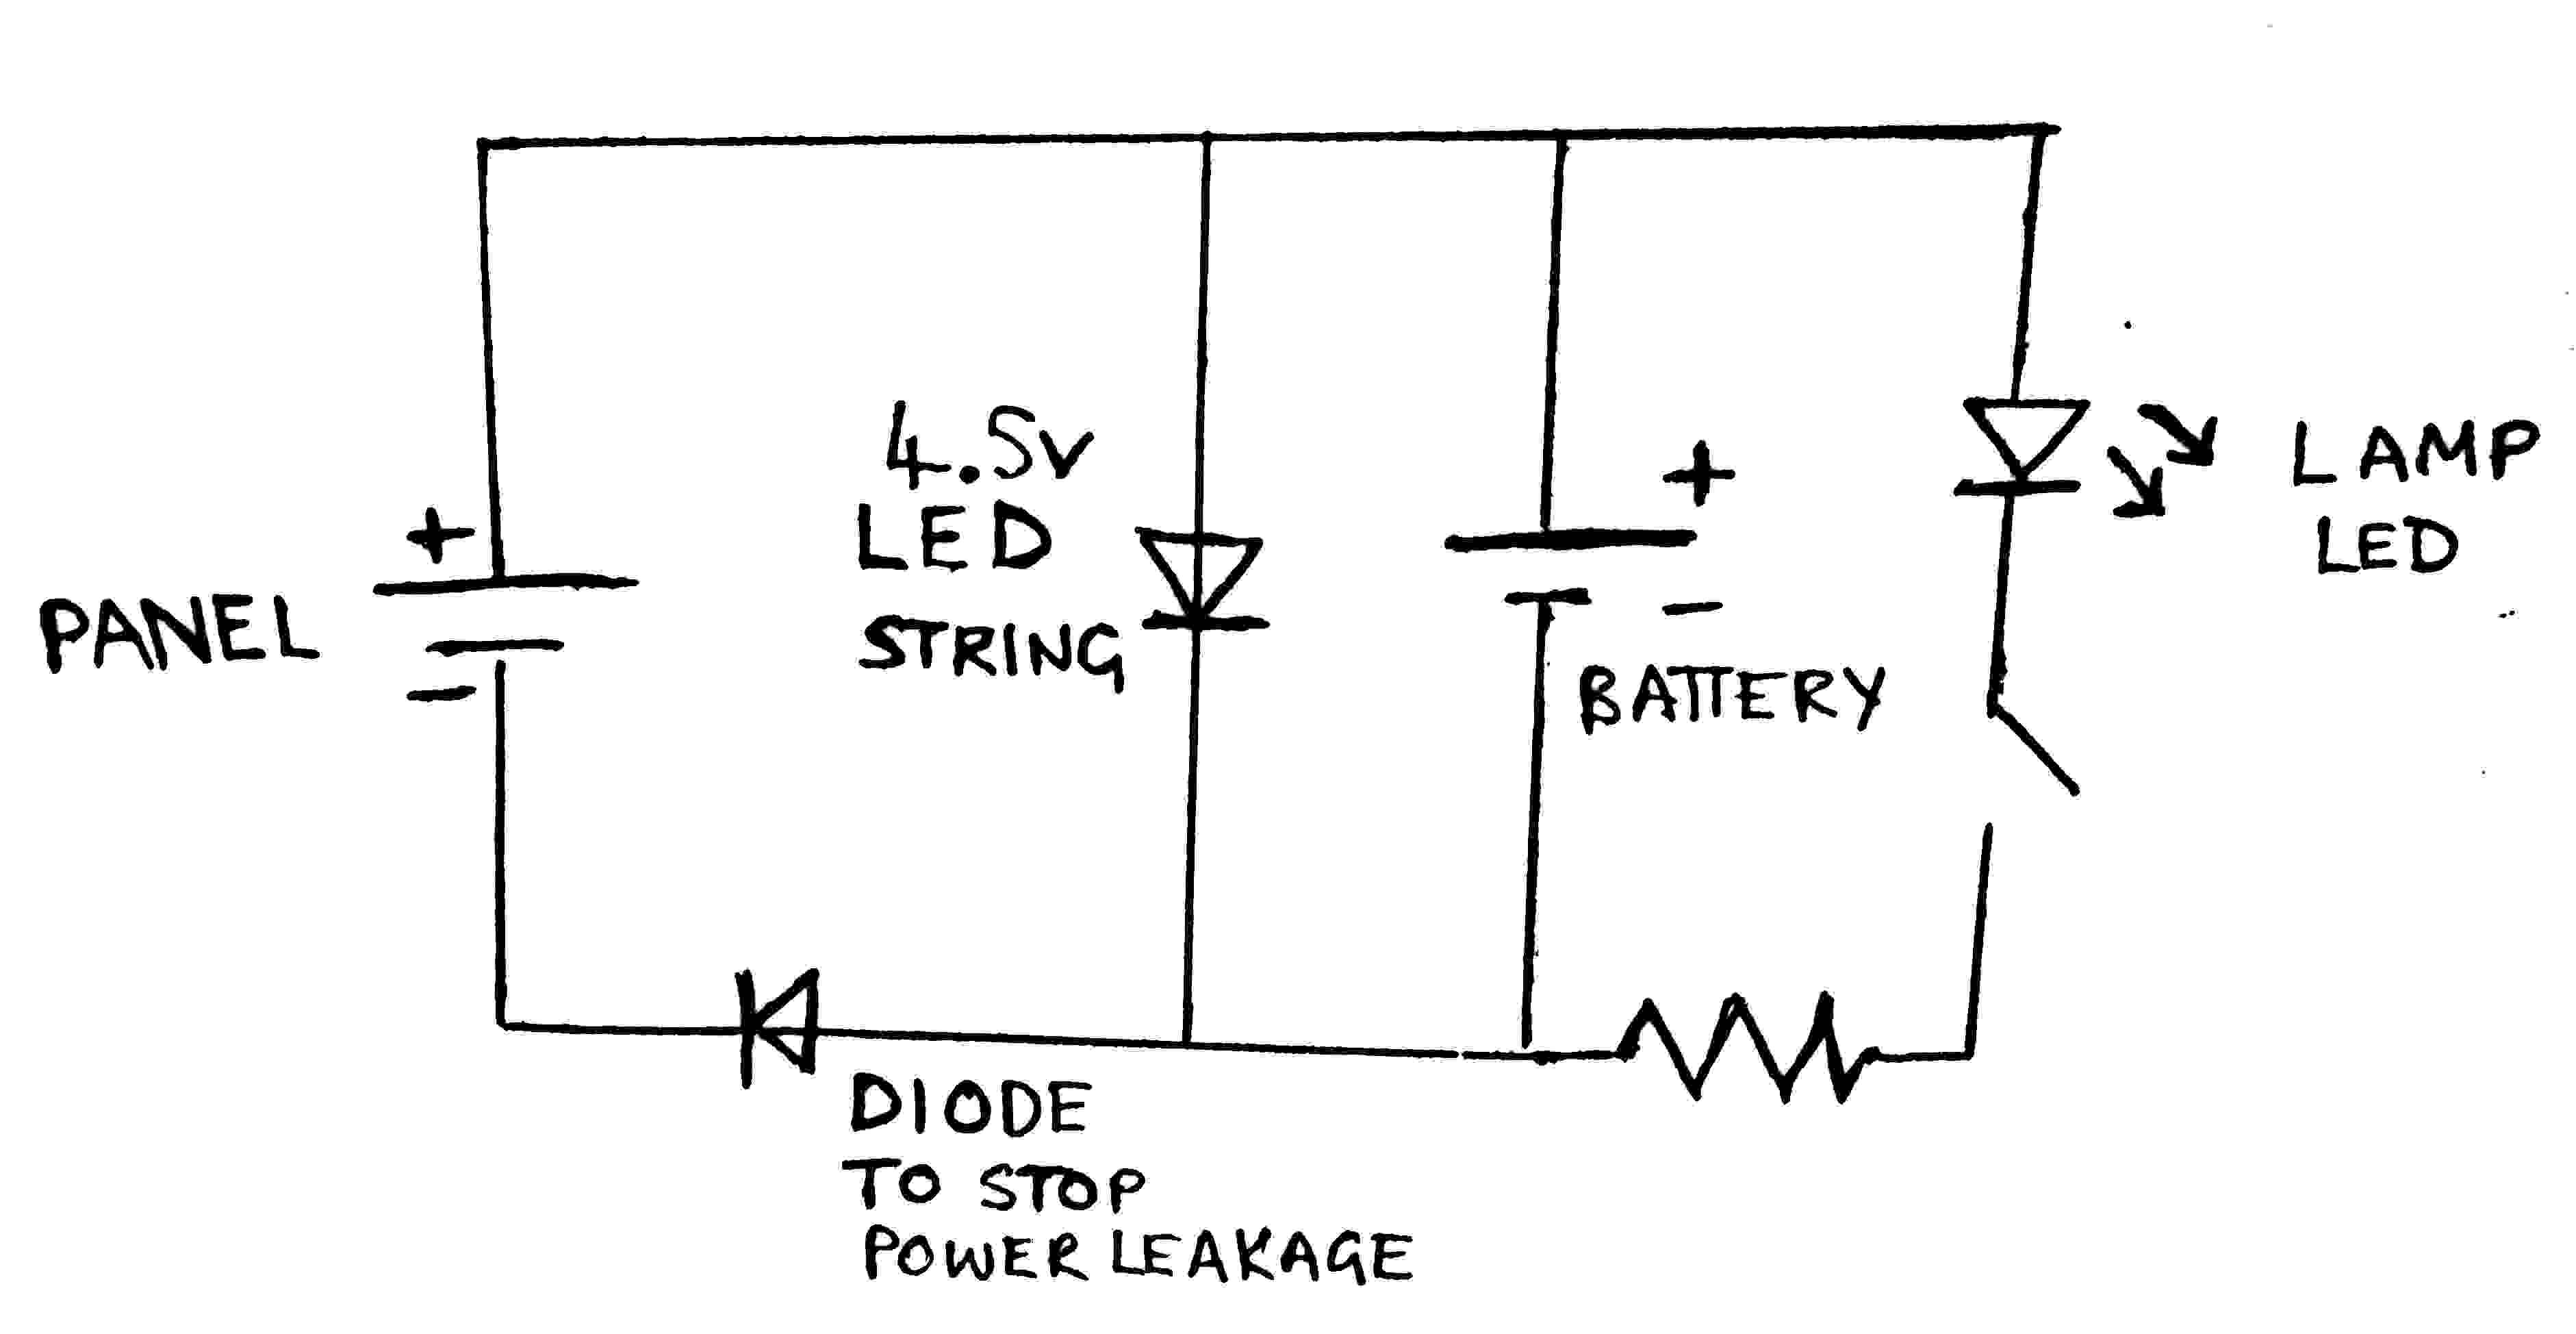 medium resolution of solar lighting wiring diagram wiring diagram third levelled solar panel wire diagram schematic diagrams solar power